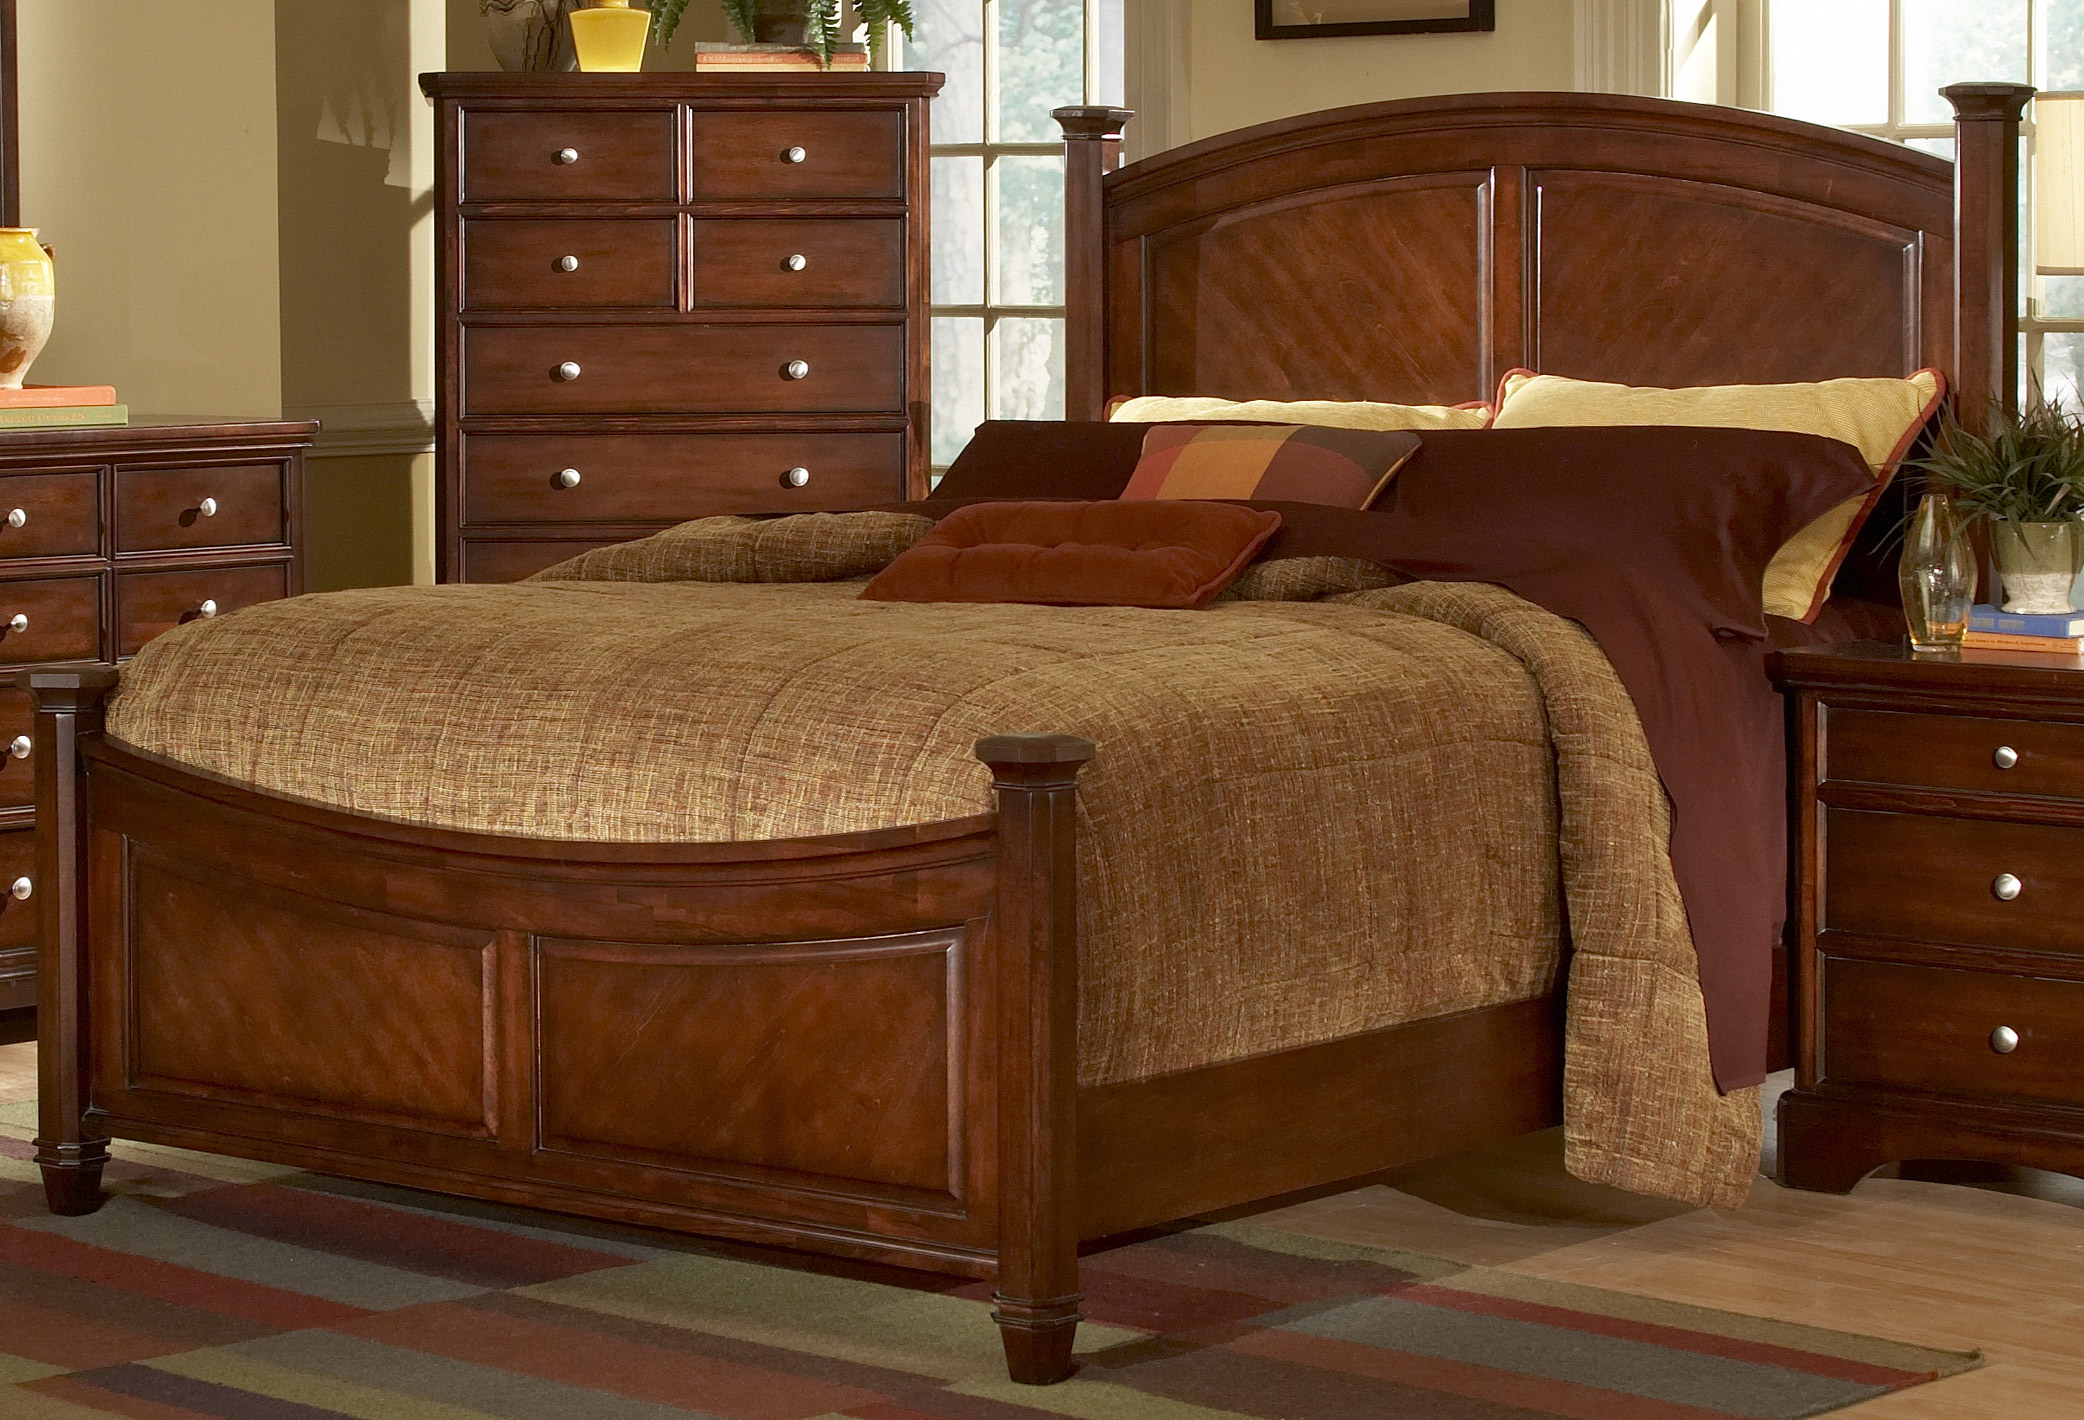 Iron Bed Metal Bed Wood Bed Headboard Laurel Heights Bed Cherry Homelegance